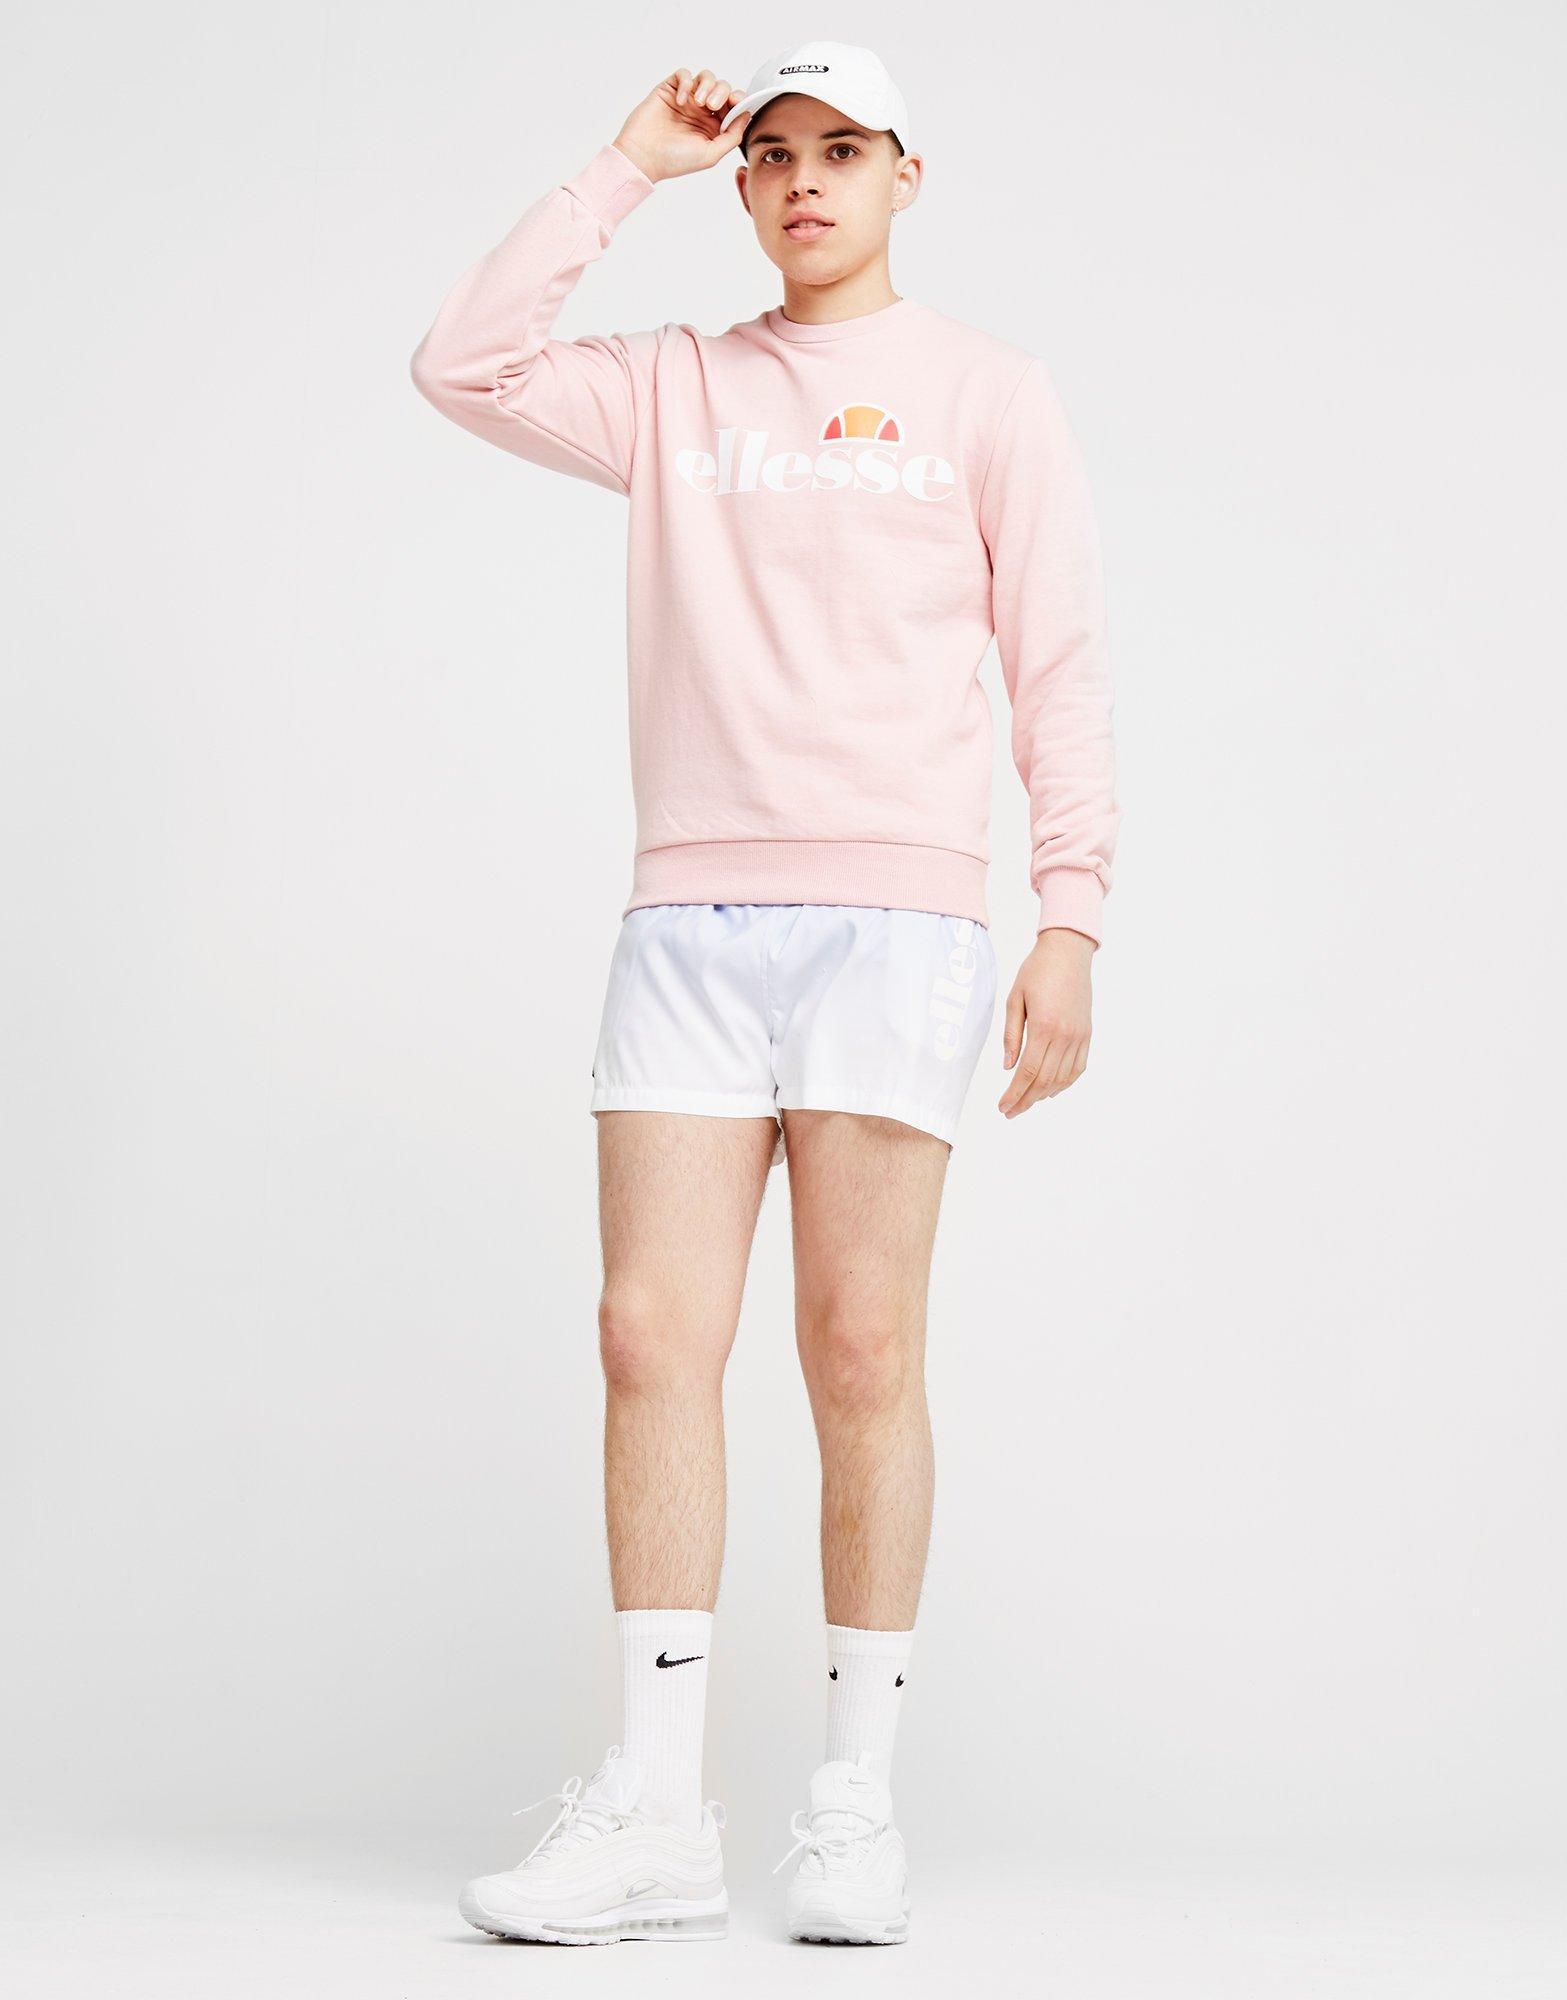 Ellesse Cotton Malspina Crew Sweatshirt in Pink for Men